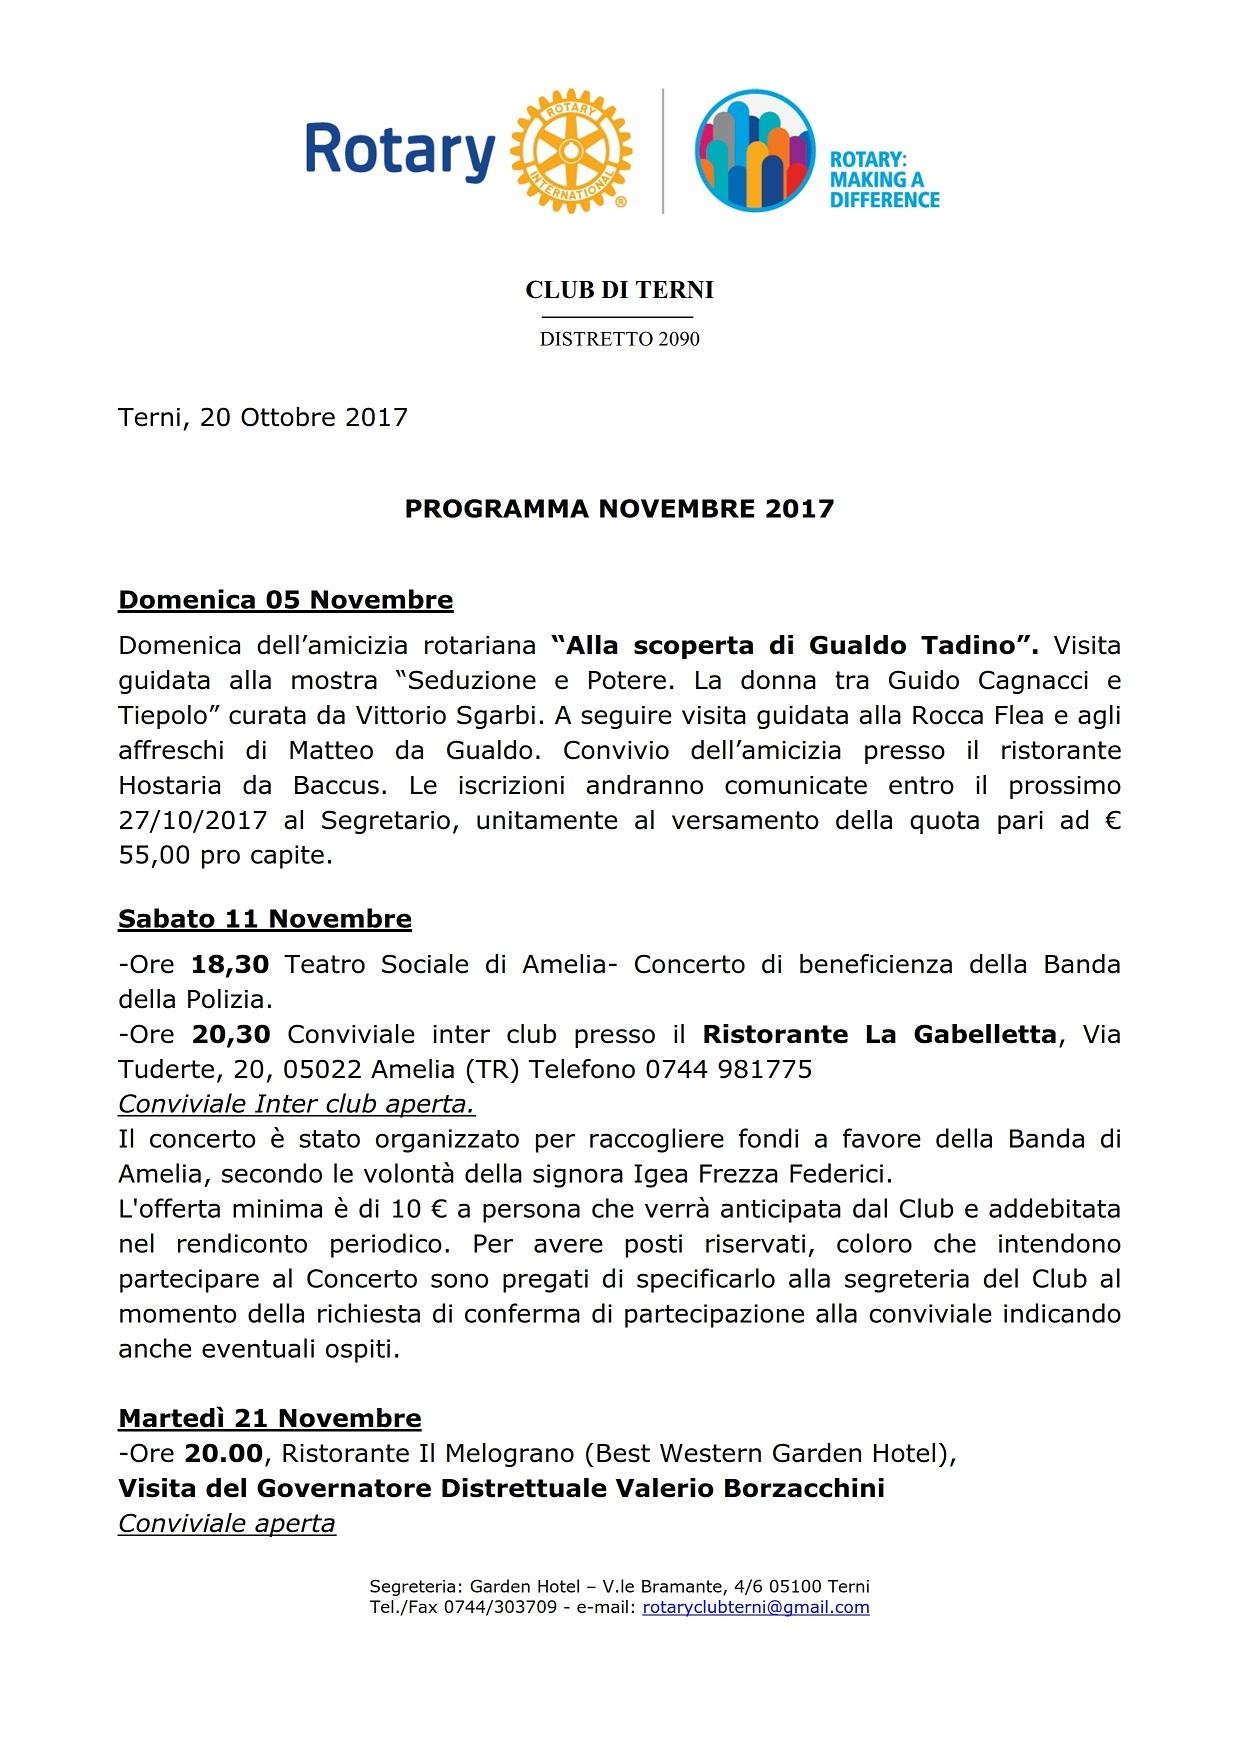 Programma Novembre 2017_001